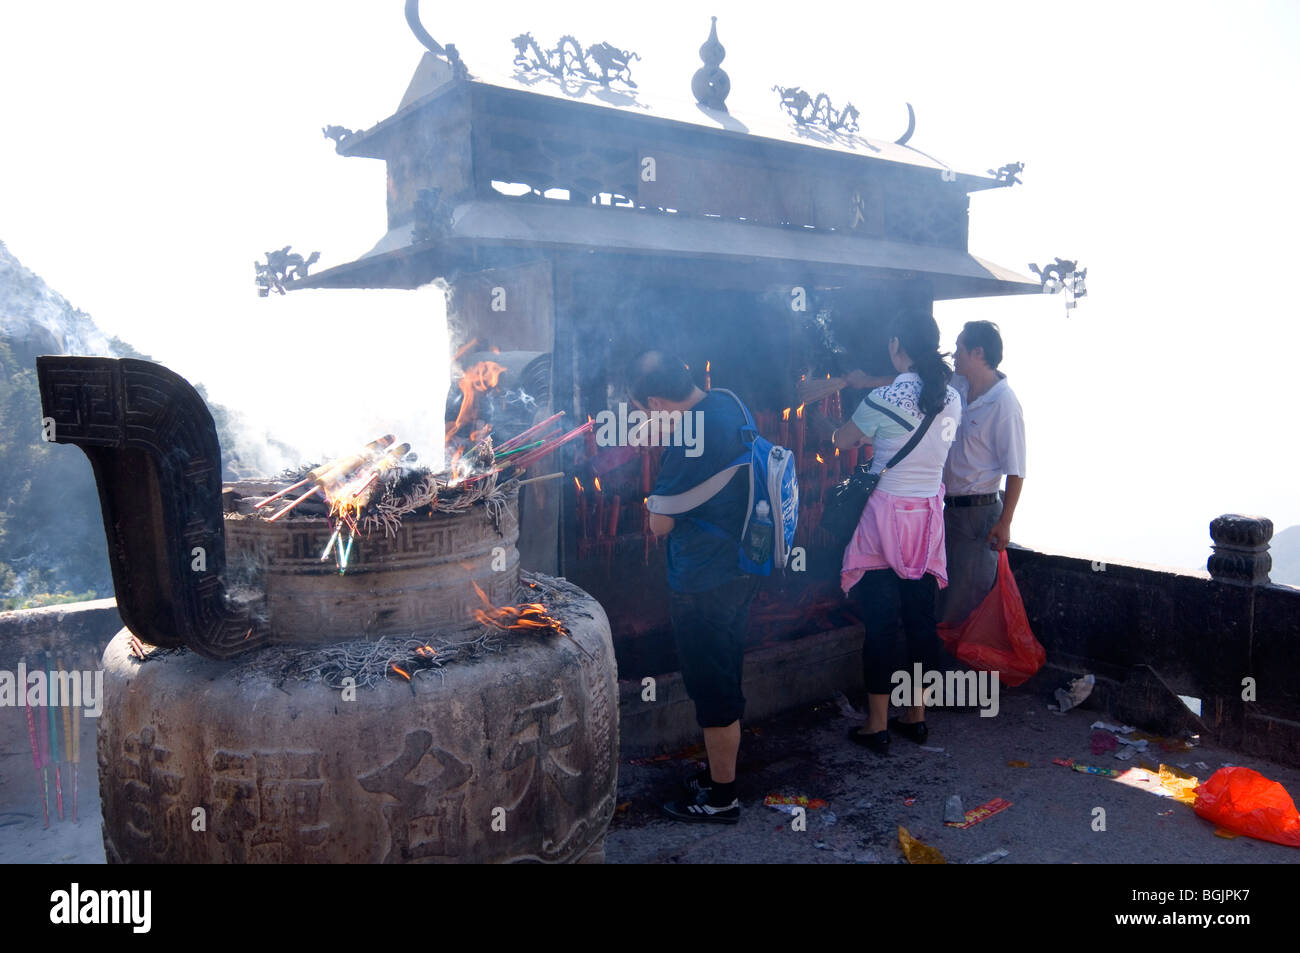 Worshipers burning incense at Tiantai Temple, or Ksitigarbha Buddhist Temple. Jiuhua Shan, Anhui province, China. - Stock Image